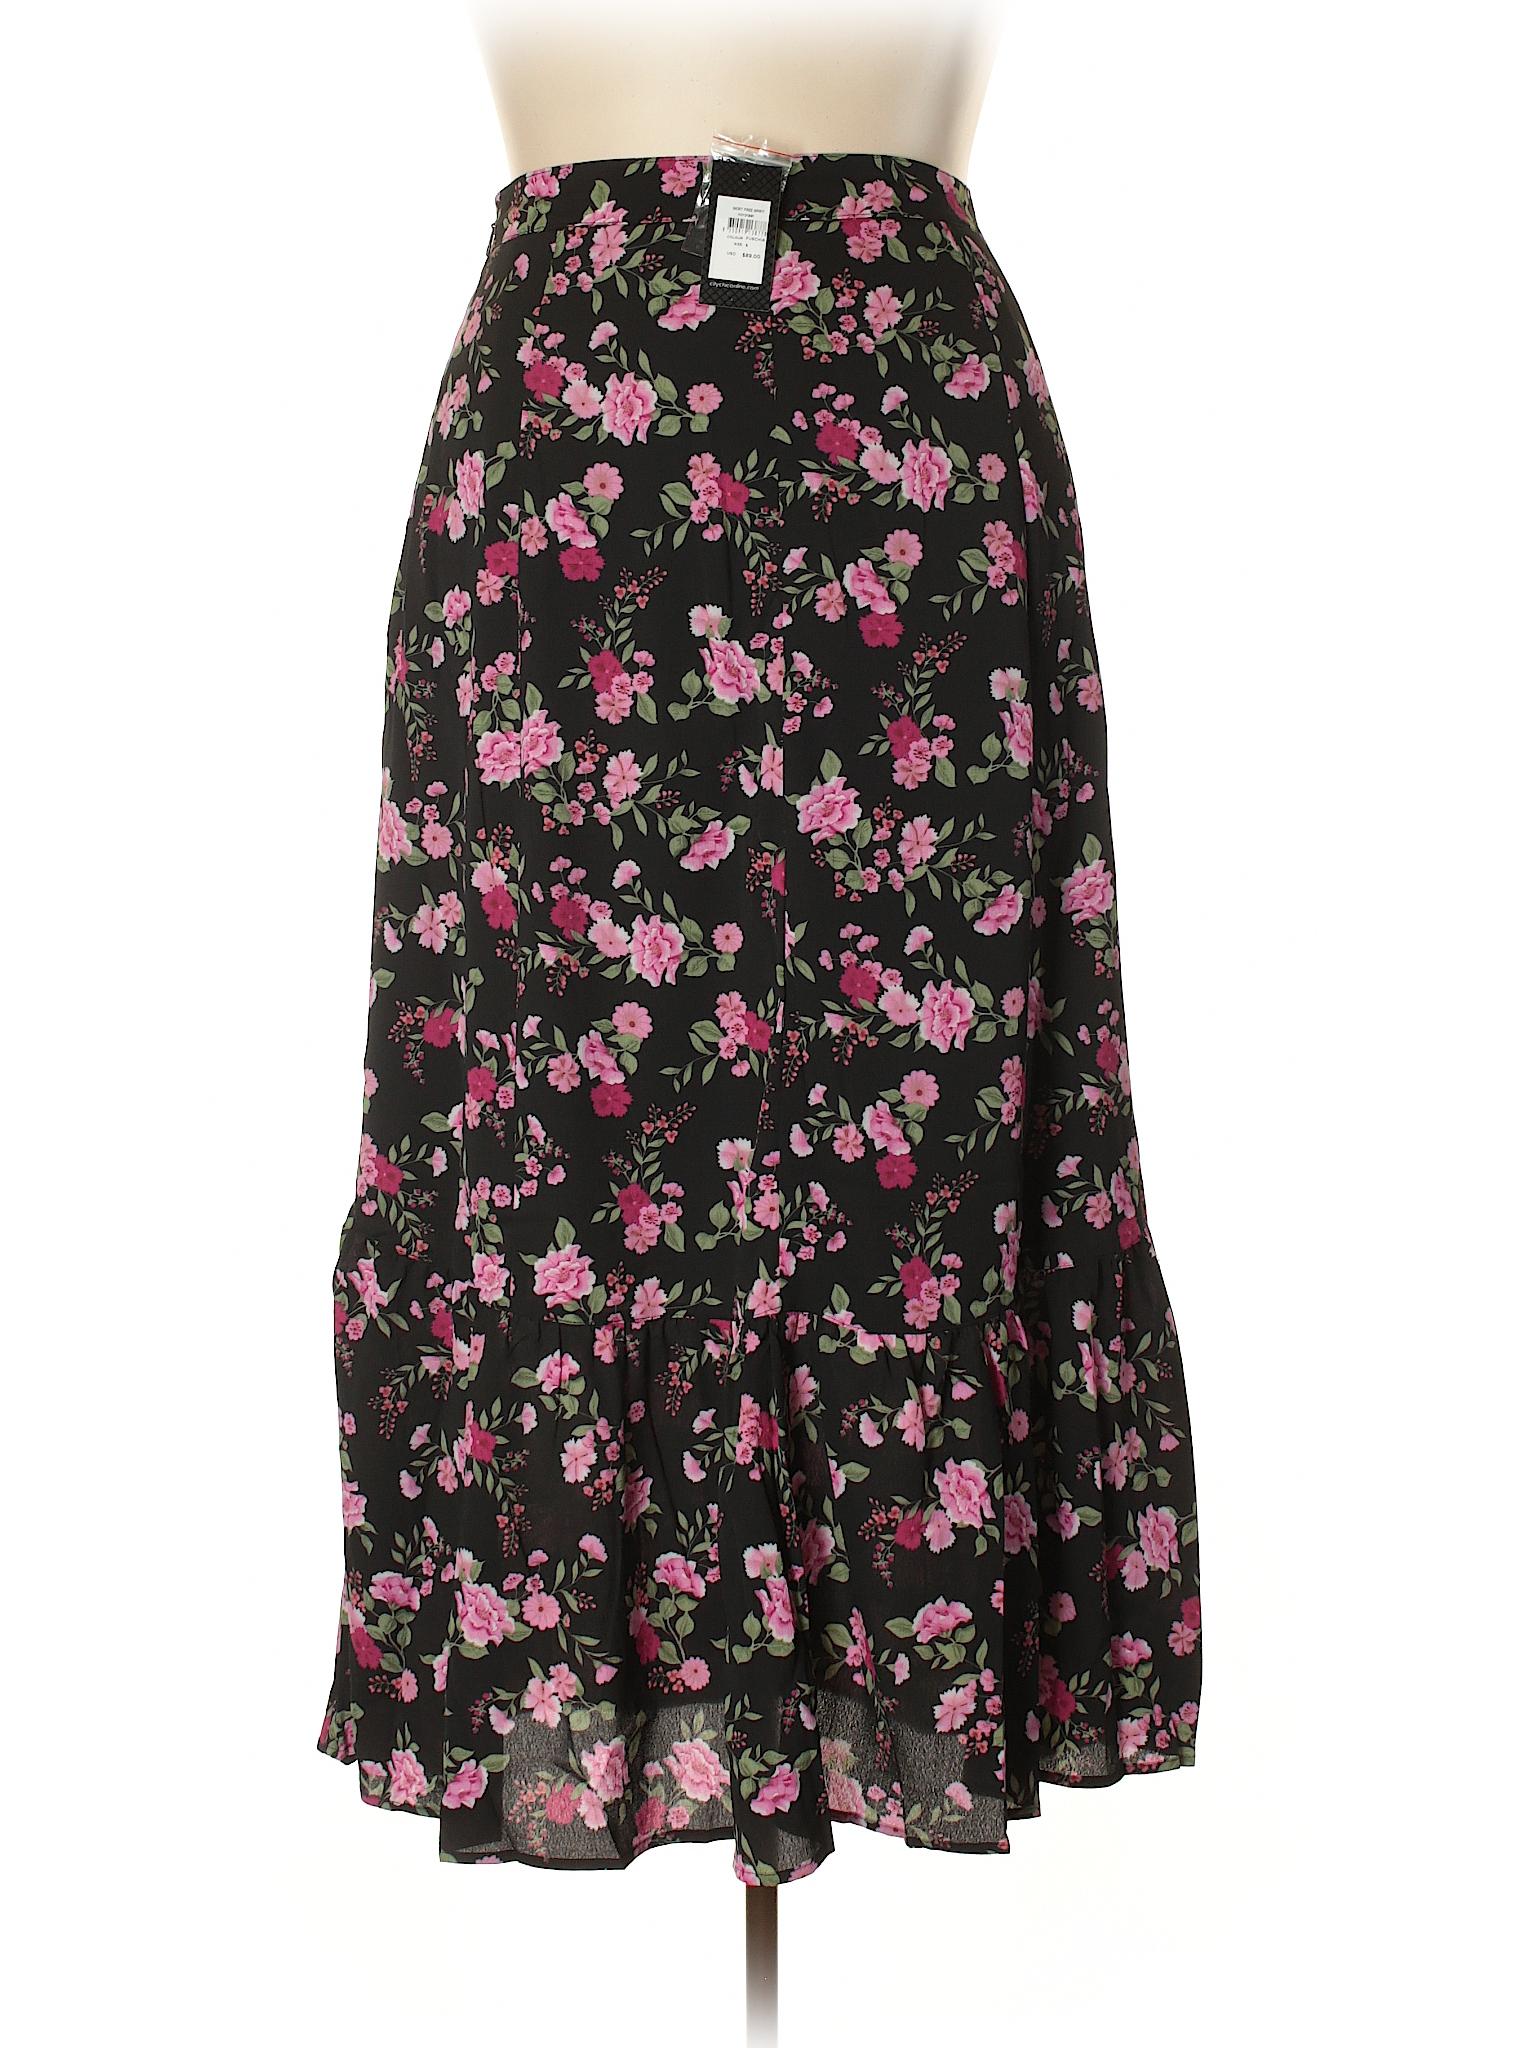 Boutique Casual City leisure Skirt Chic qrpSnqtTx